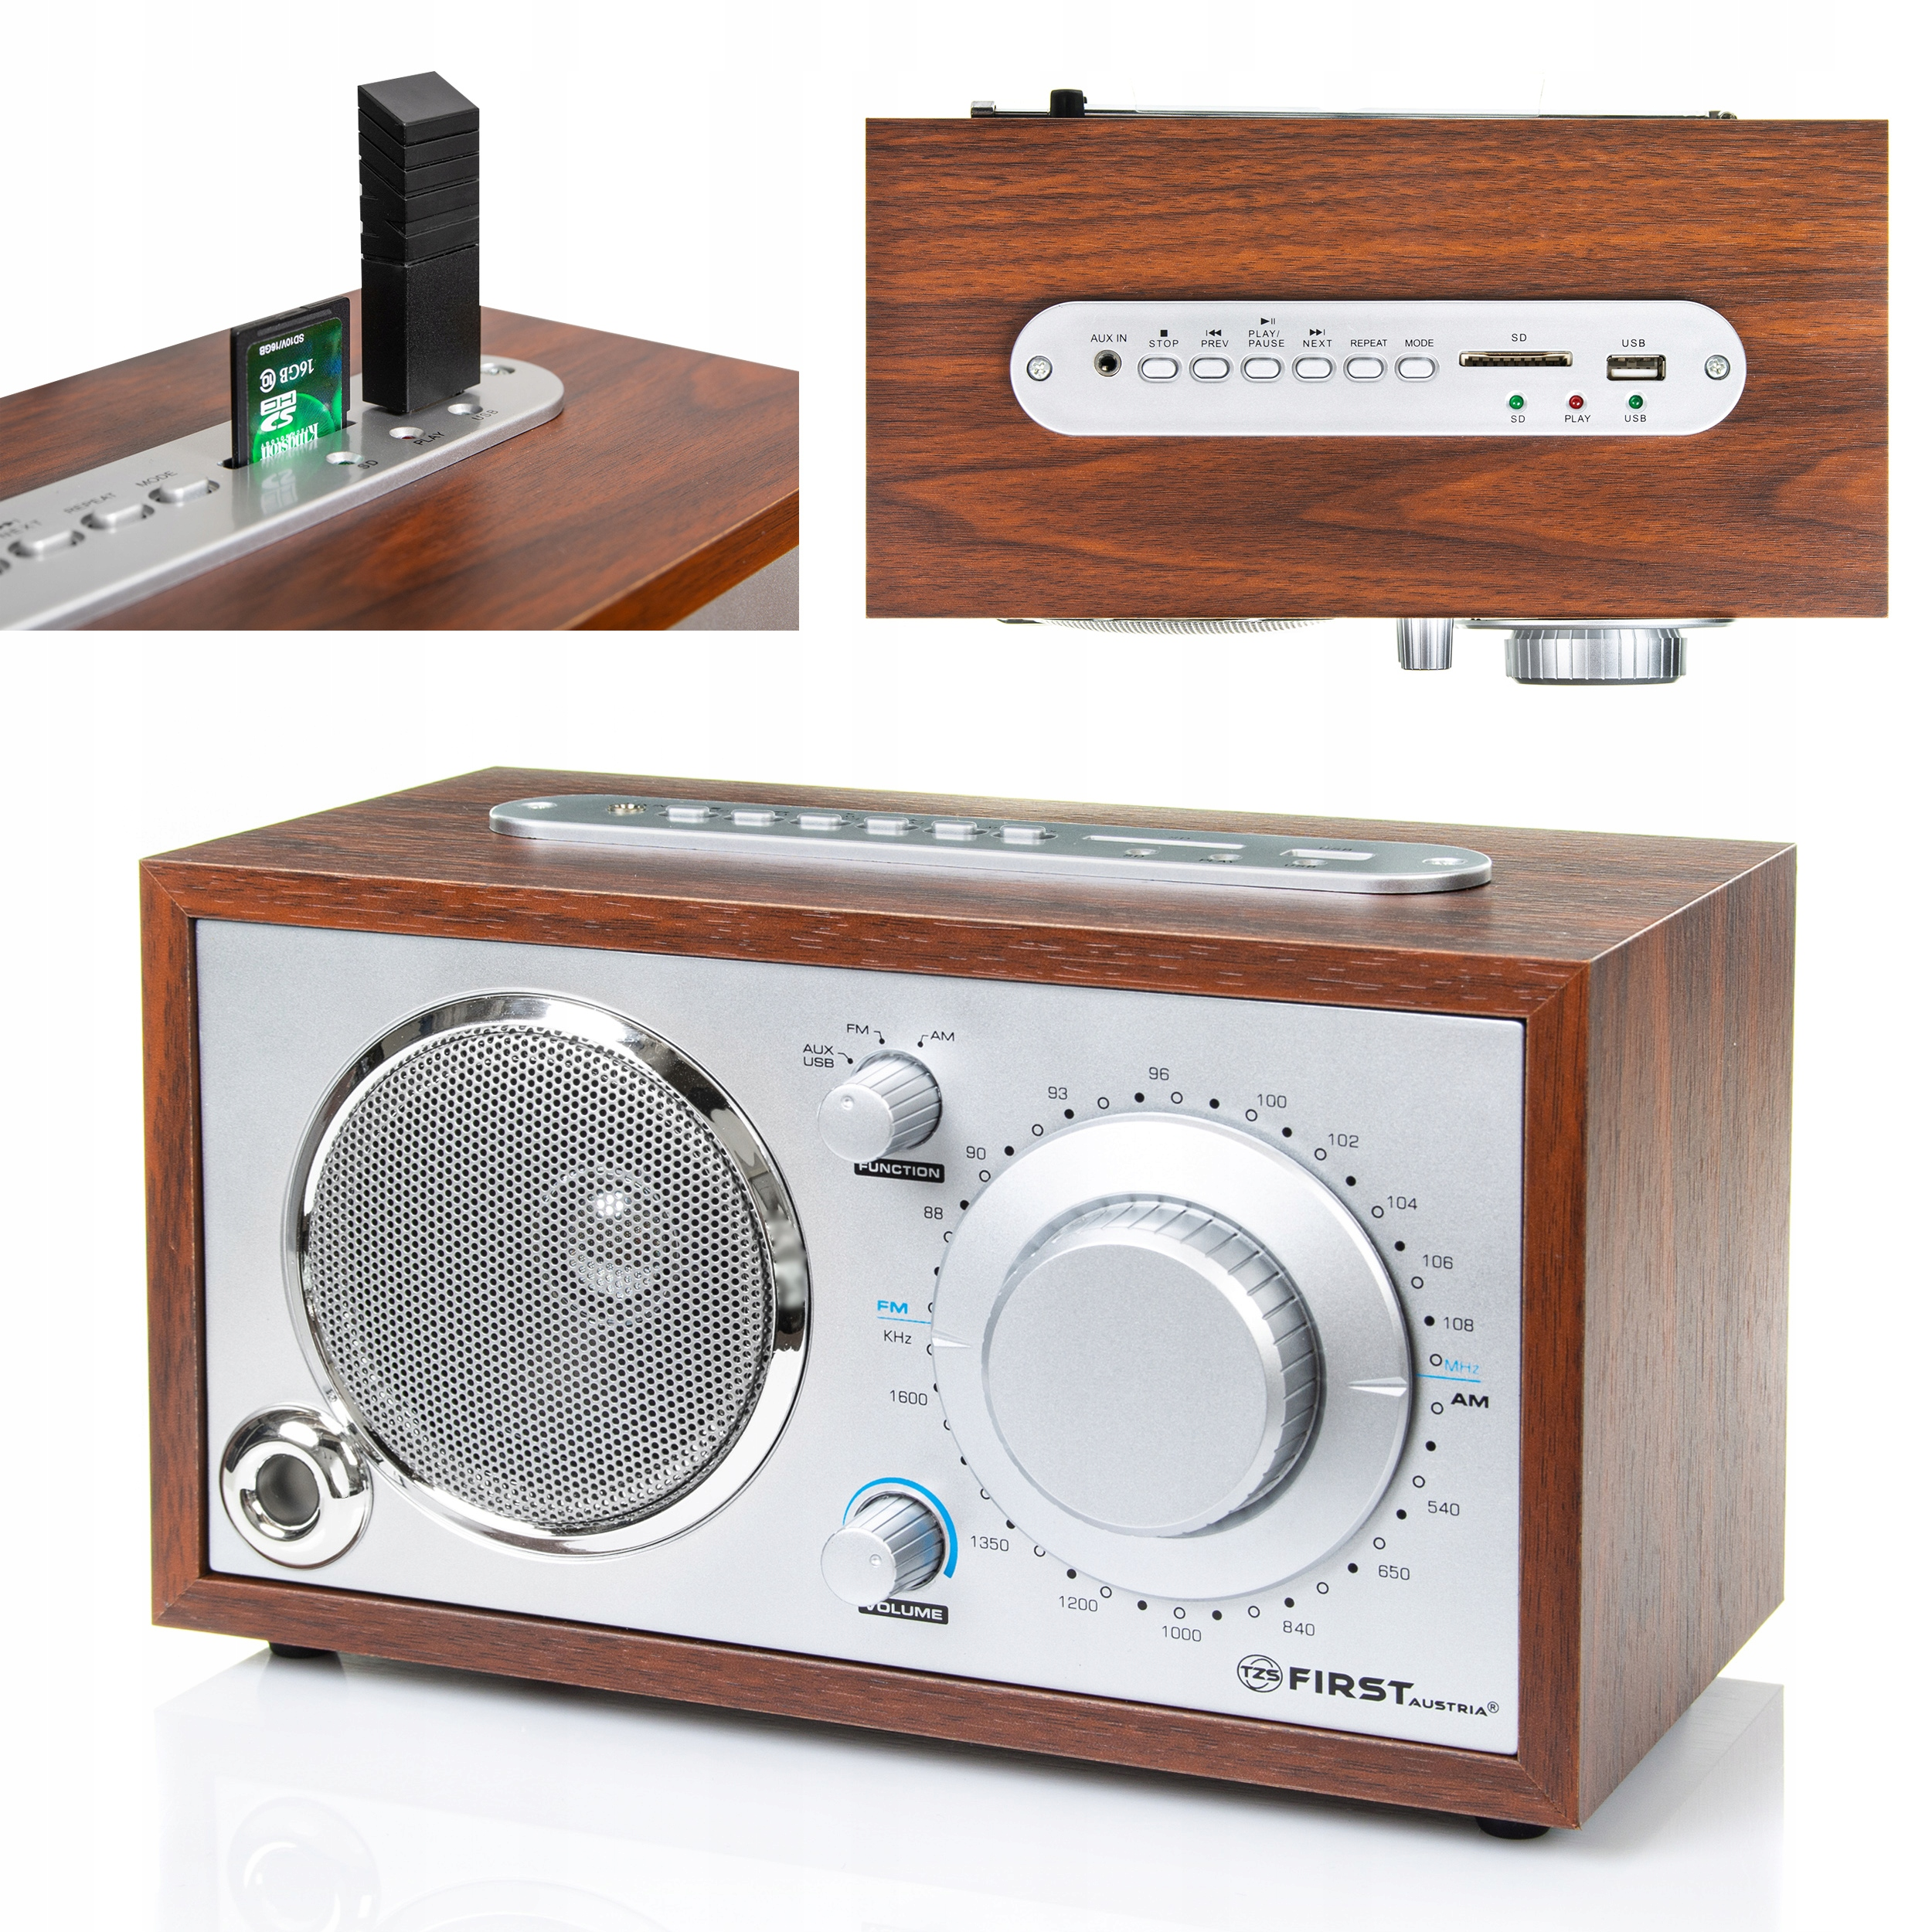 Радио Ретро Классика USB SD WOOD First Австрия